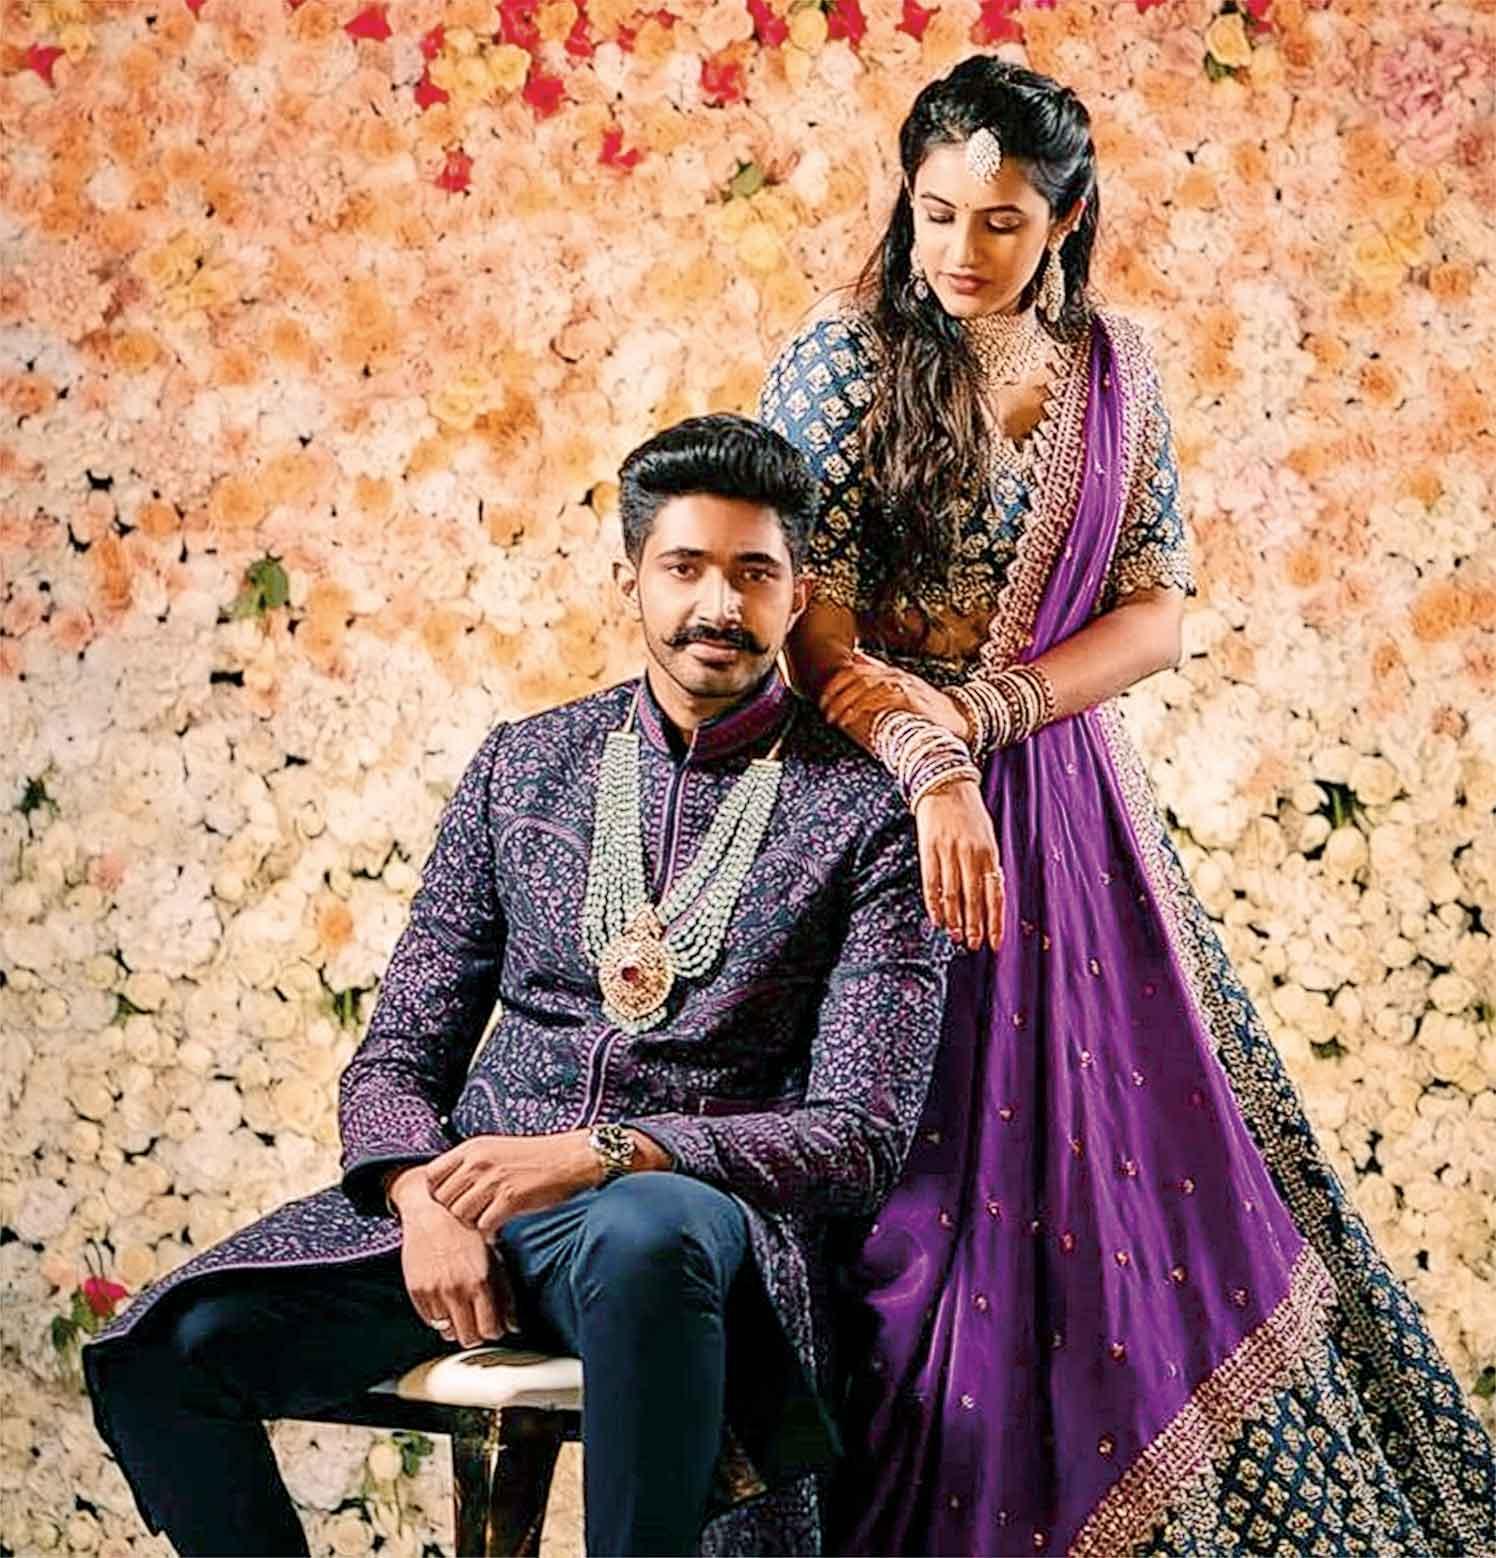 REVEALED: Varun Tej has planned a destination wedding for Niharika Konidela  & Chaitanya Jonnalagadda | Telugu Movie News - Times of India